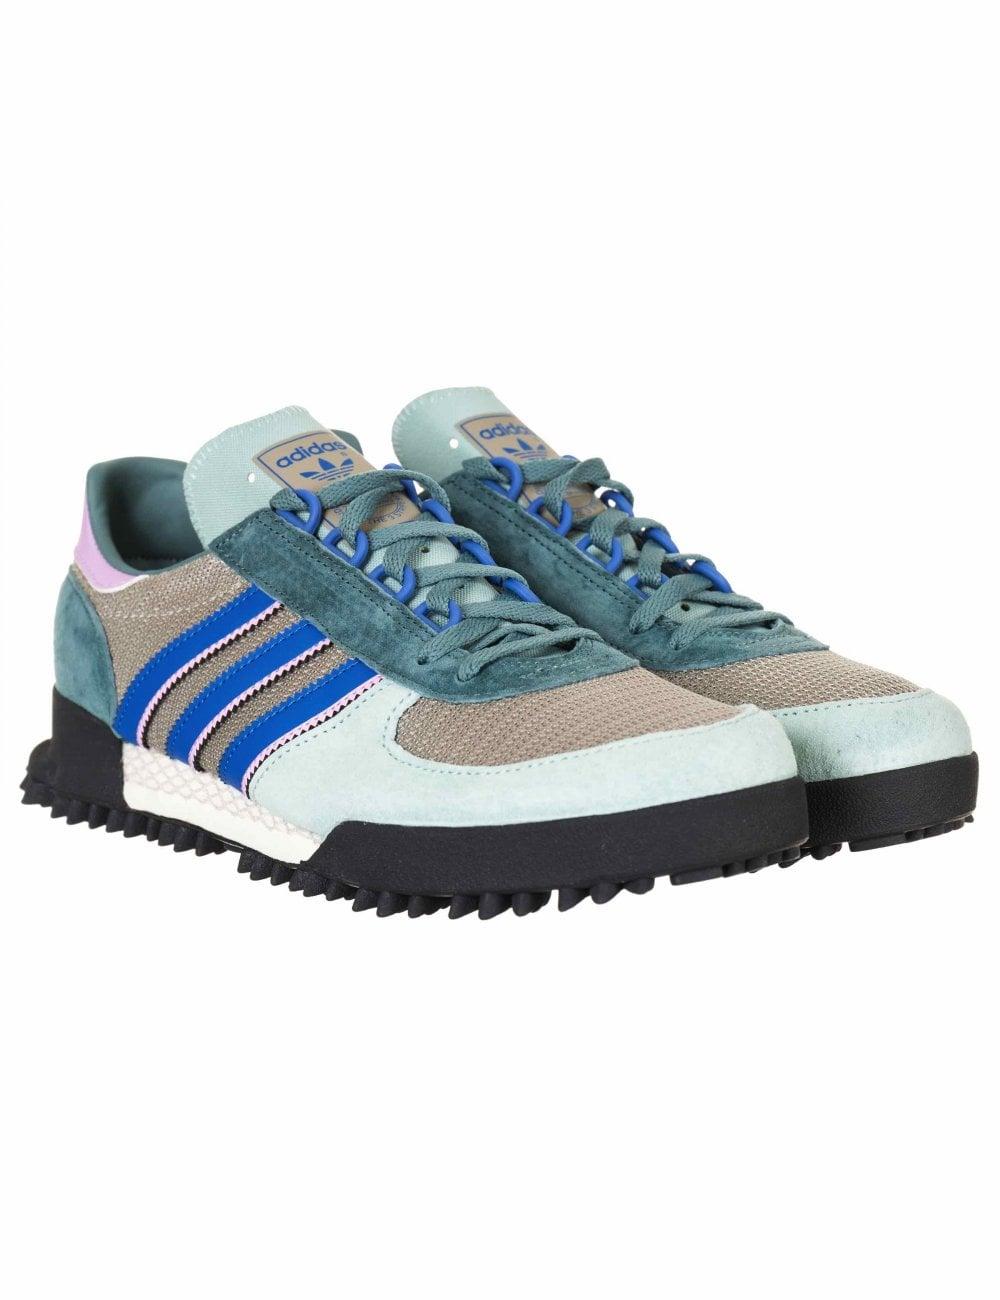 fb28d2d13ef3 Adidas Originals Marathon TR Trainers - Ash Green Chalk White ...